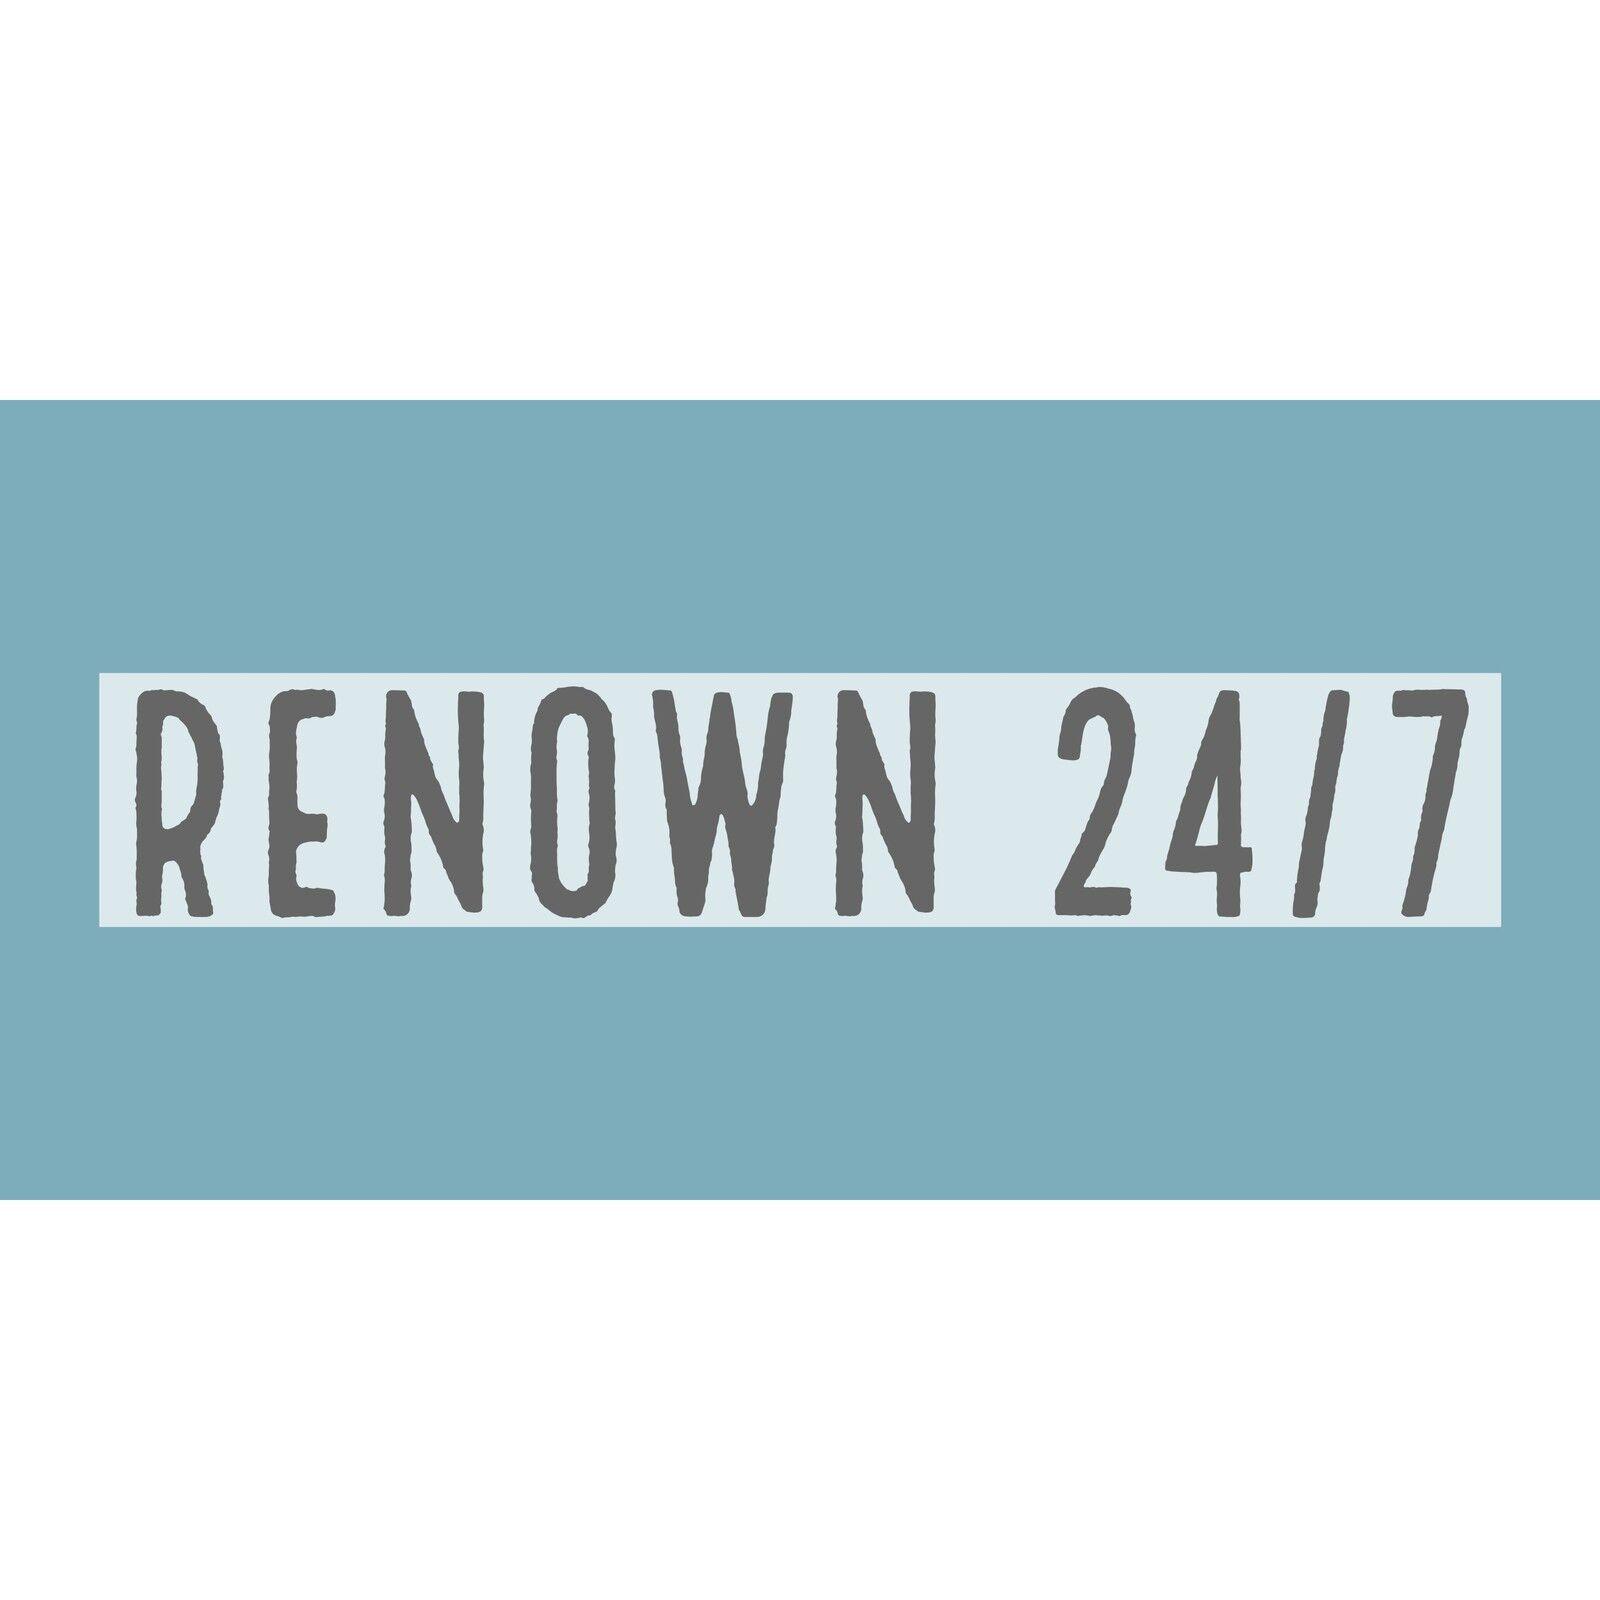 Renown 24/7